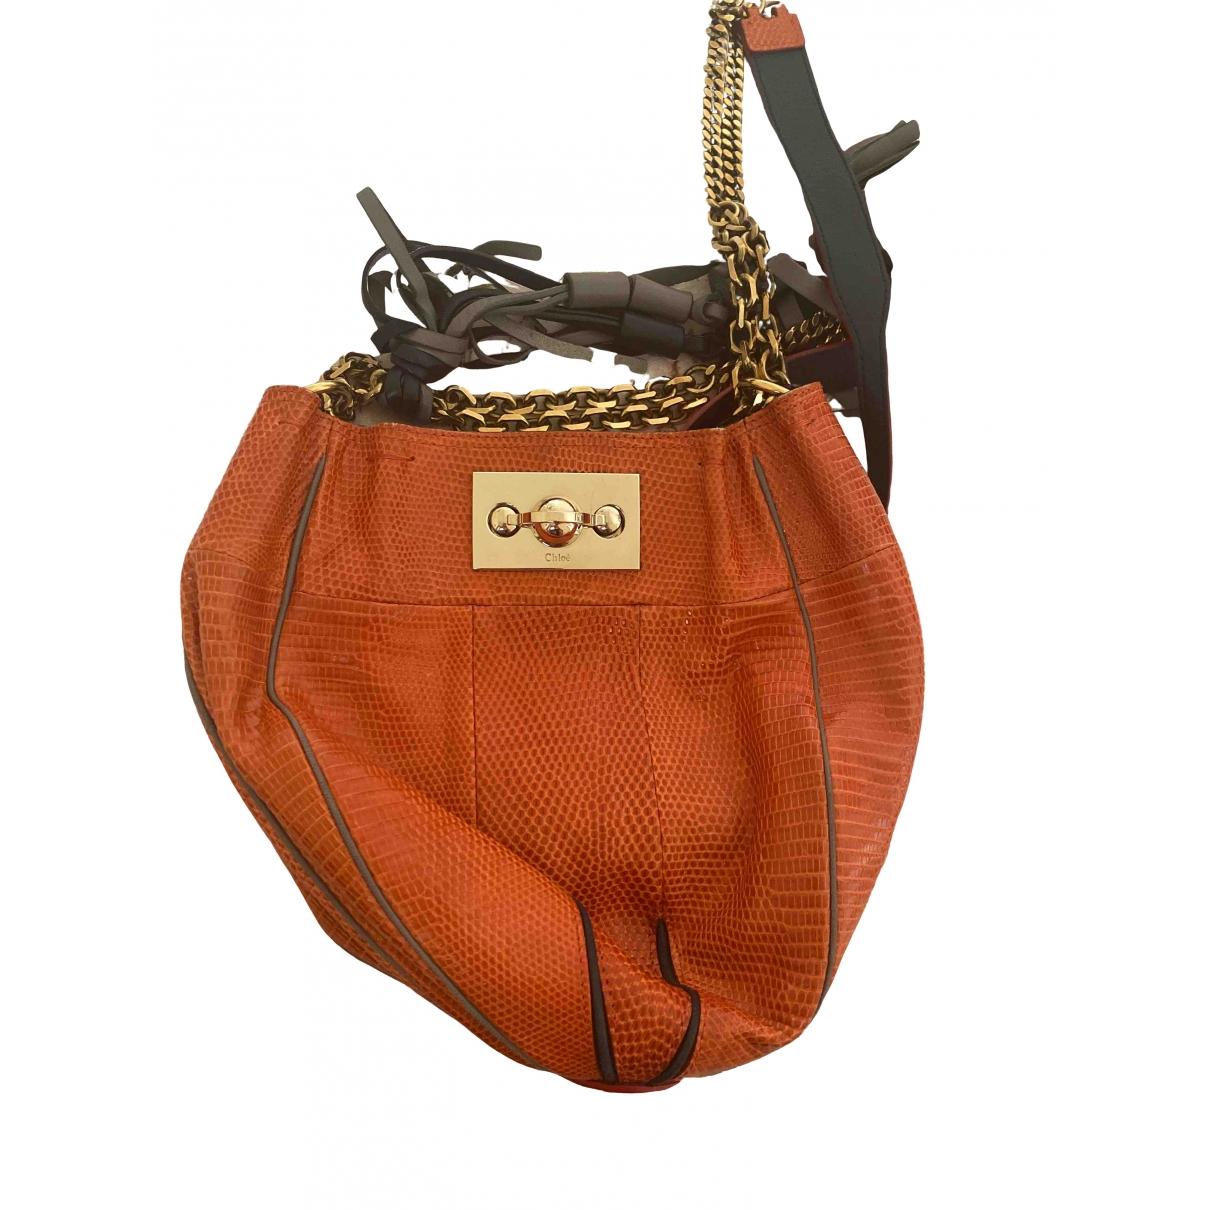 Chloe \N Handtasche in  Orange Leder